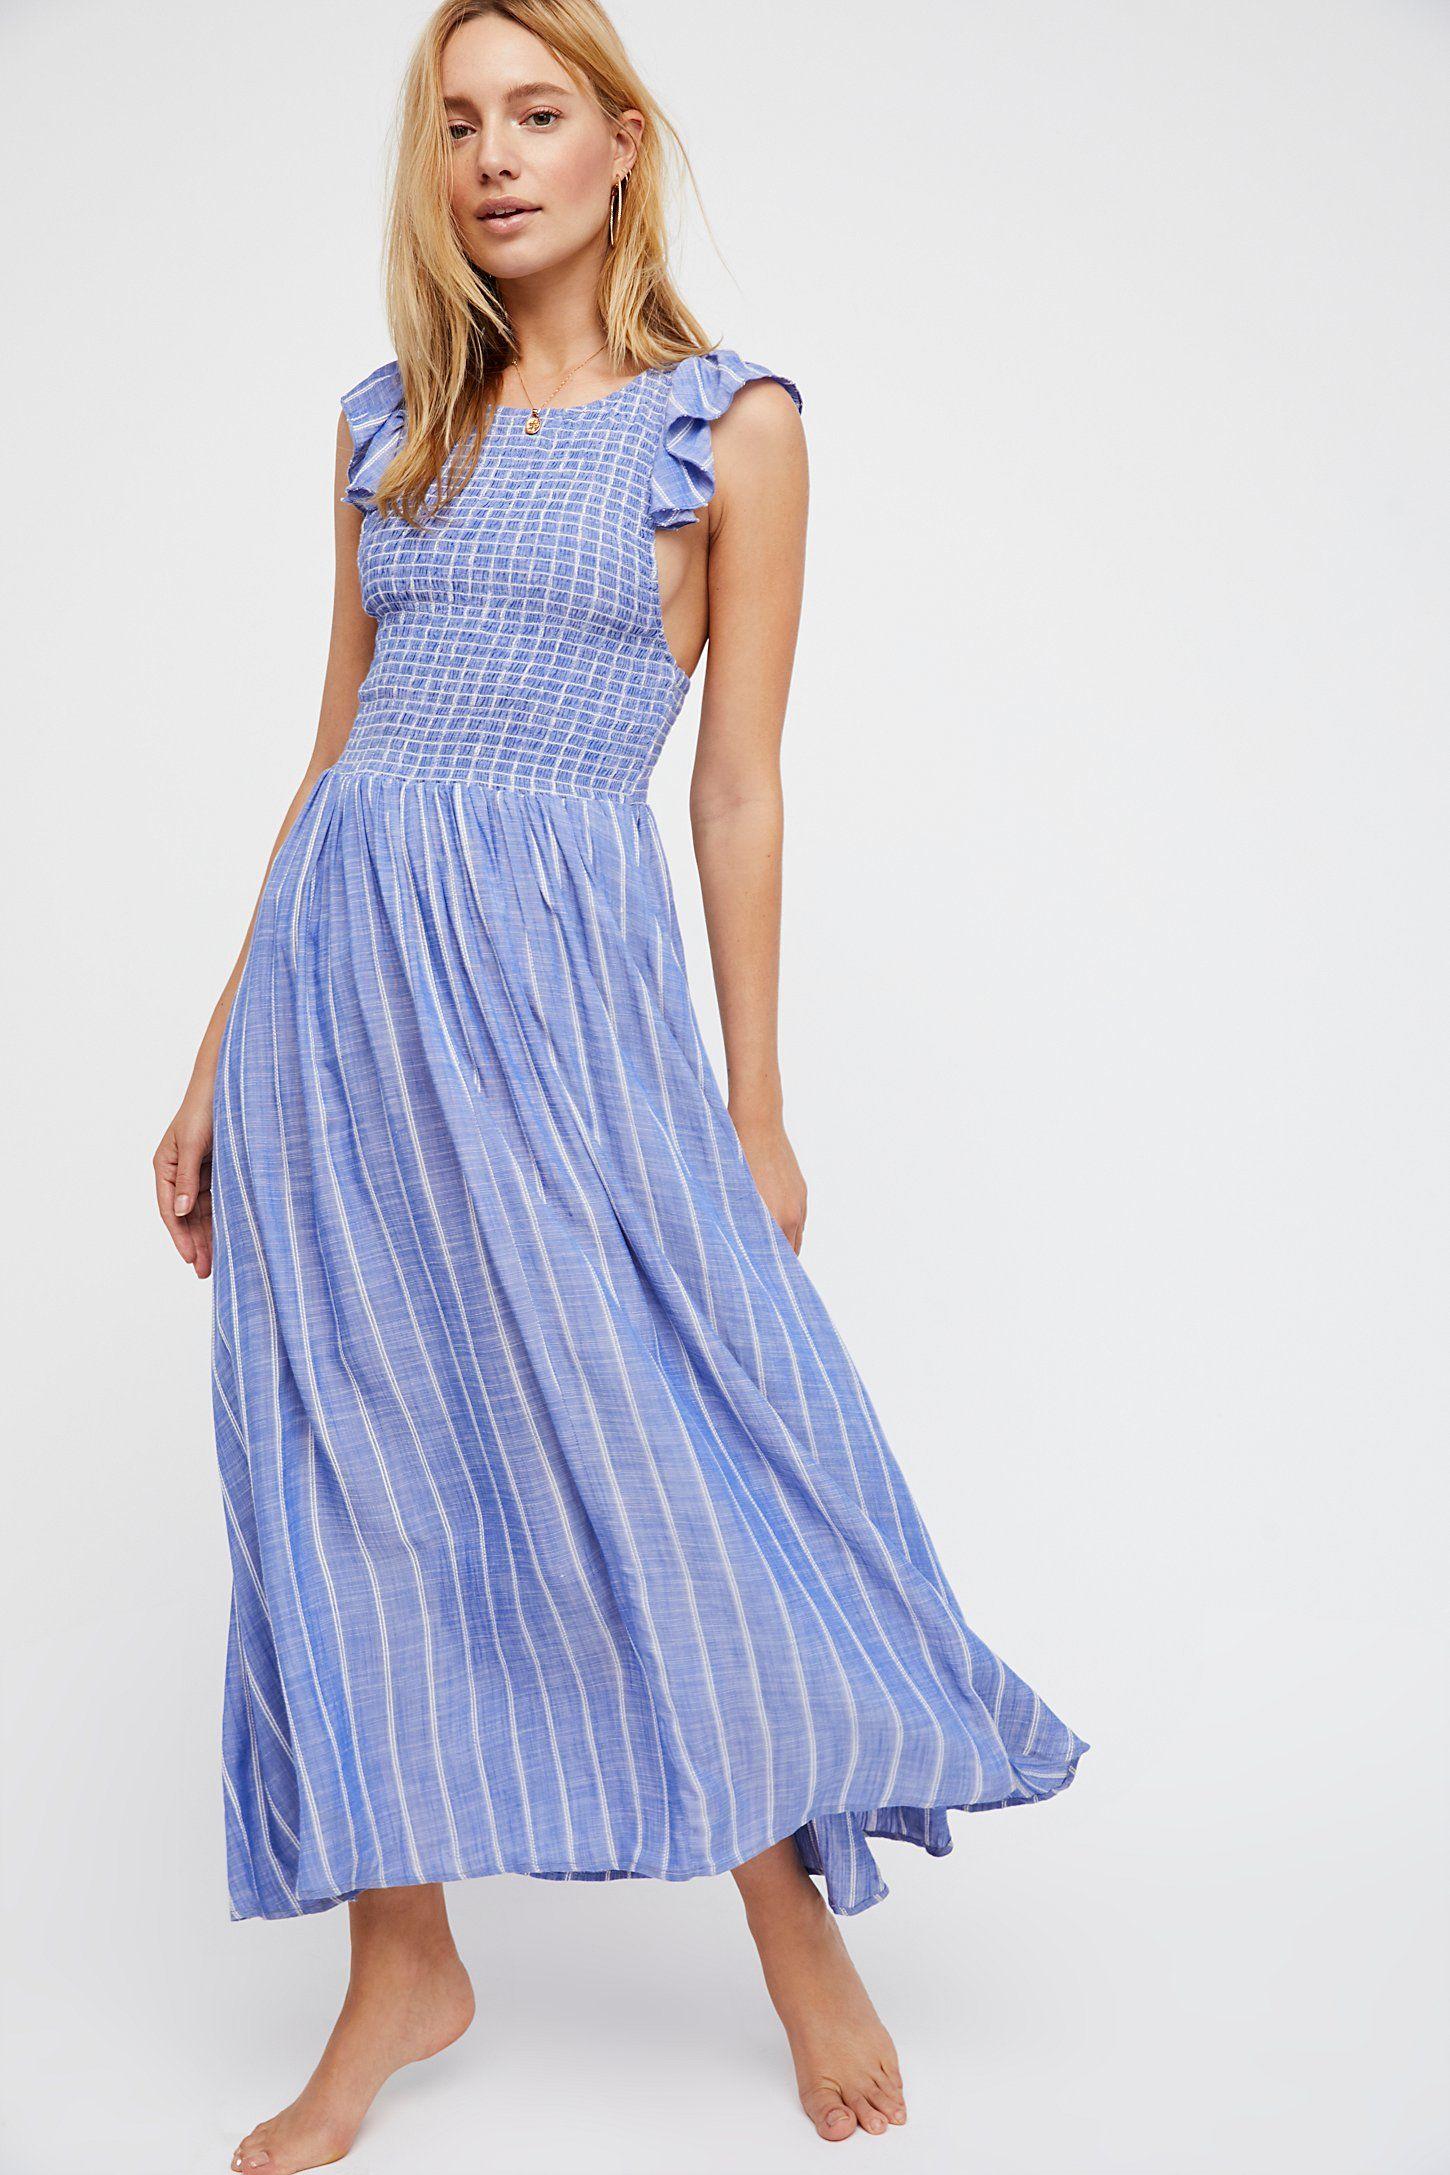 d6bb83a2fd Chambray Butterflies Midi Dress | Closet | Dresses, Fashion ...